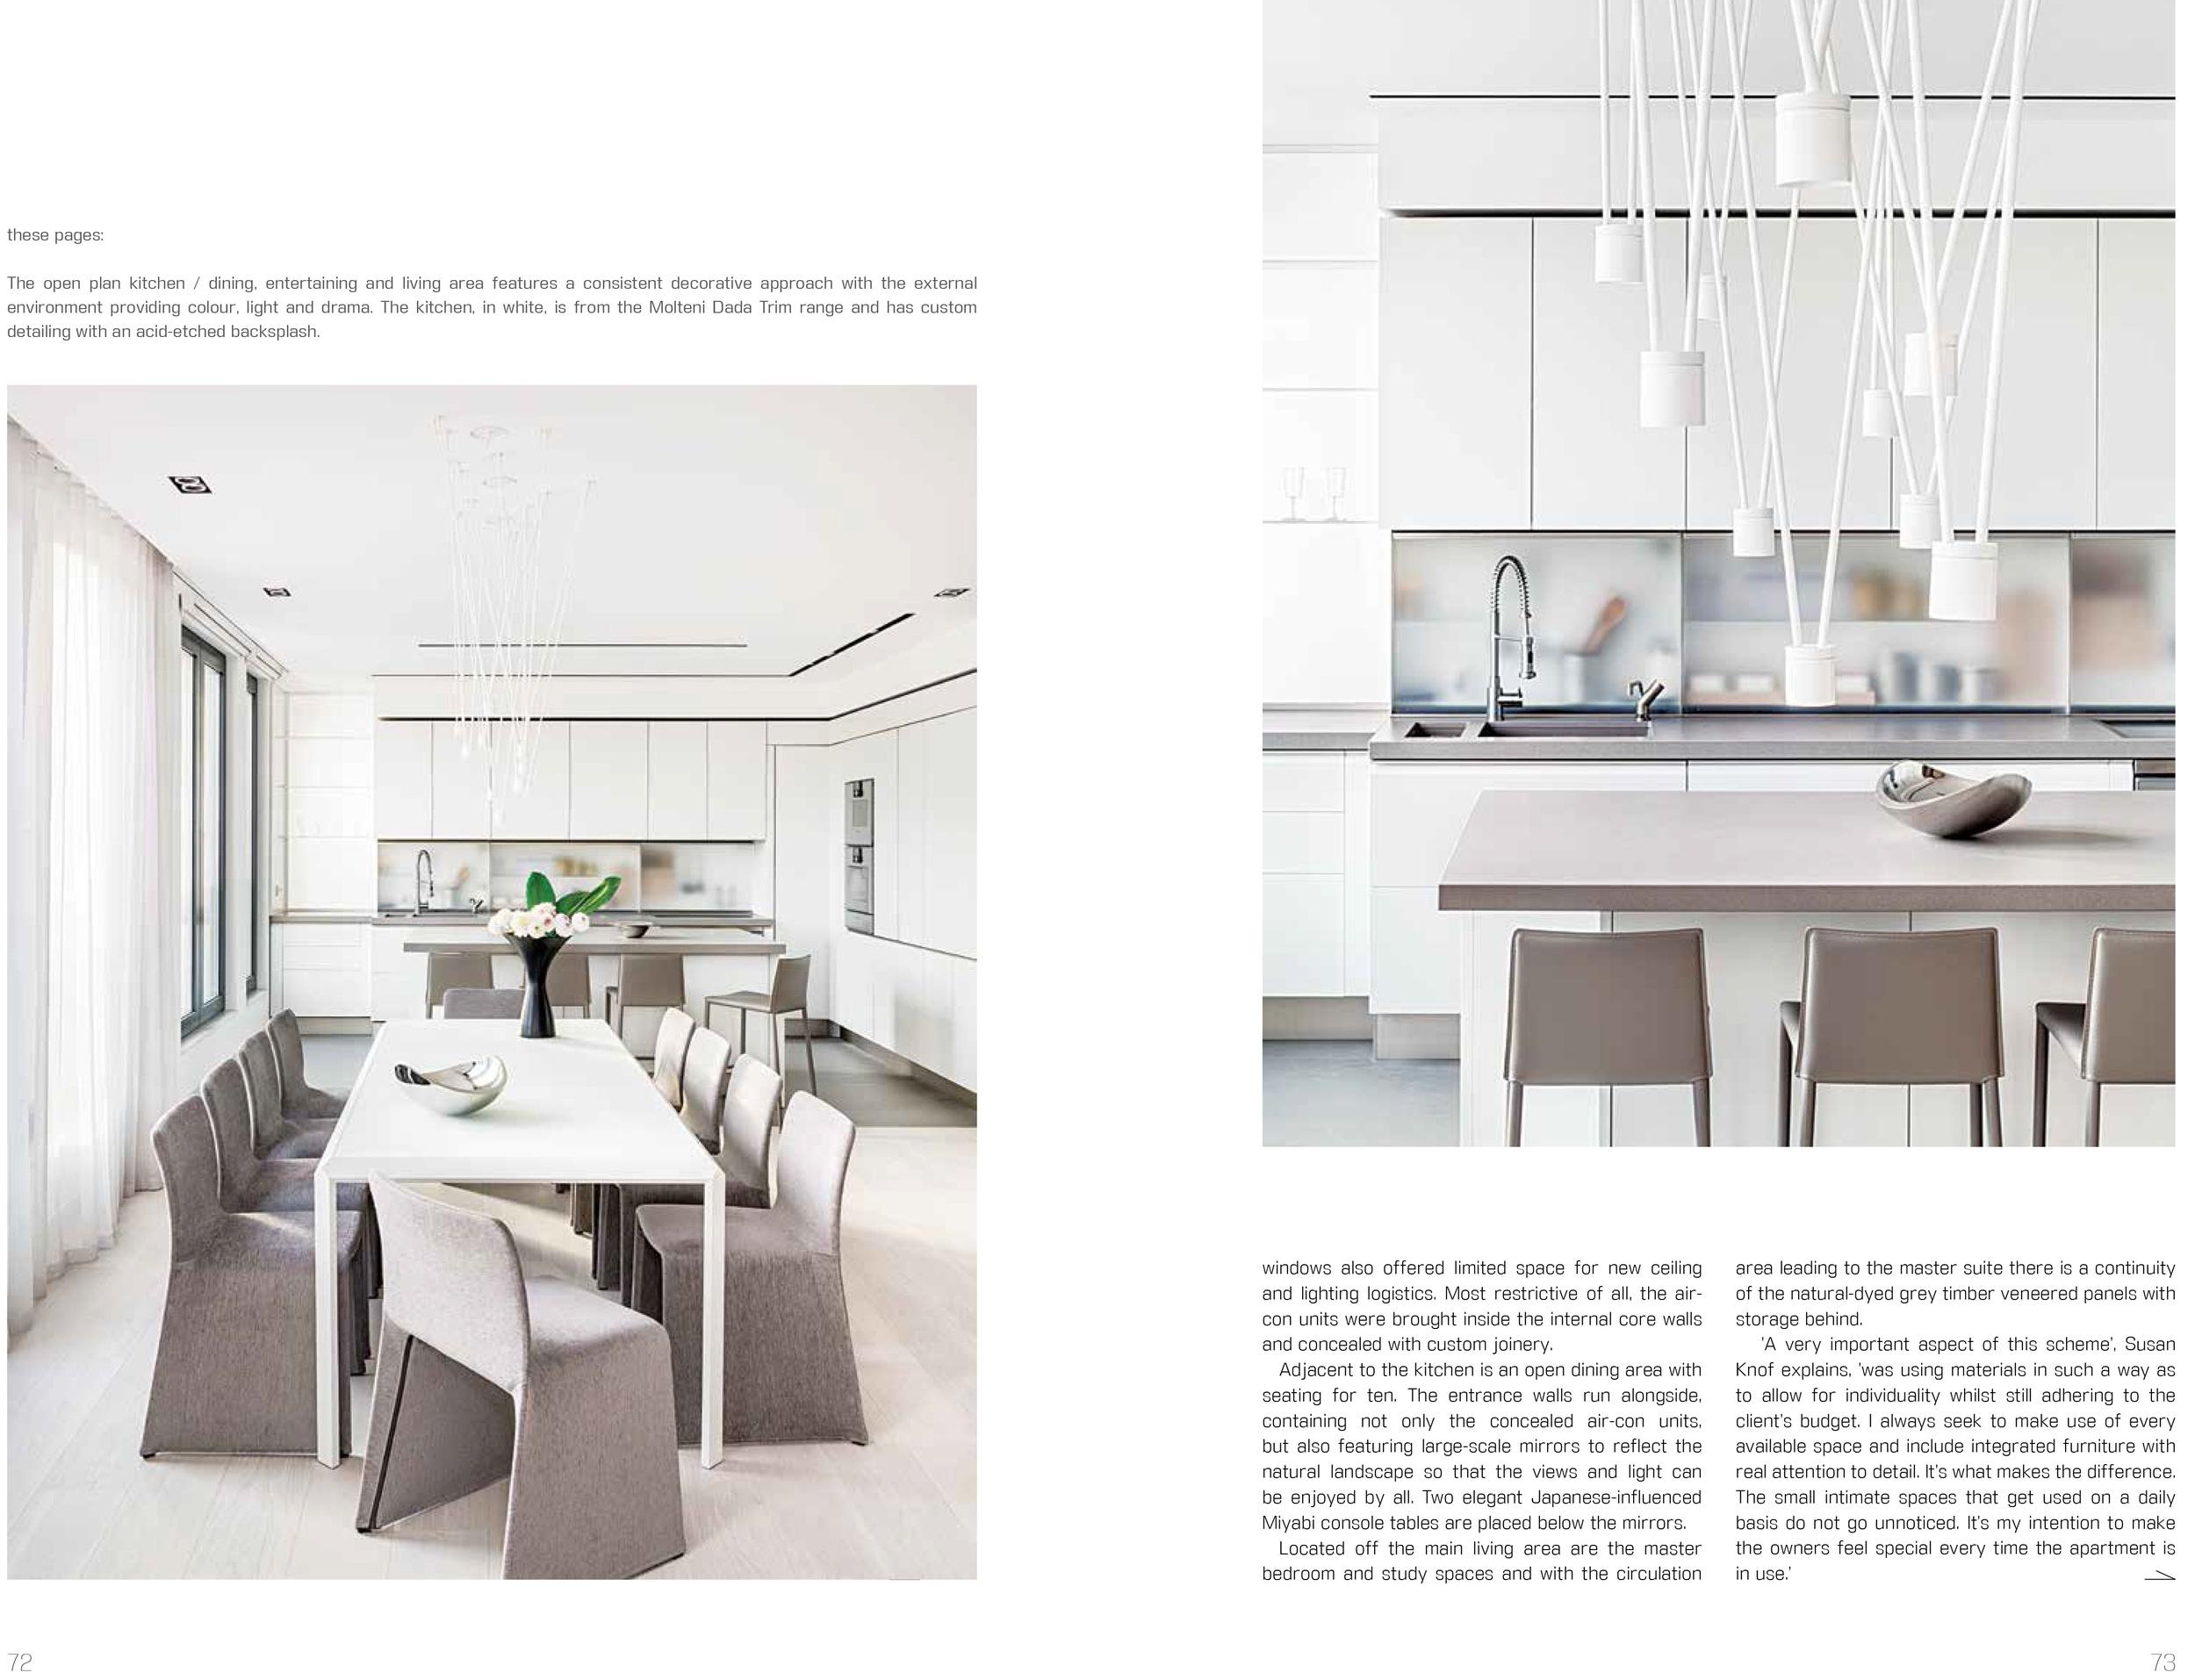 Habitat-KNOFdesign-Sept-OCt 2015